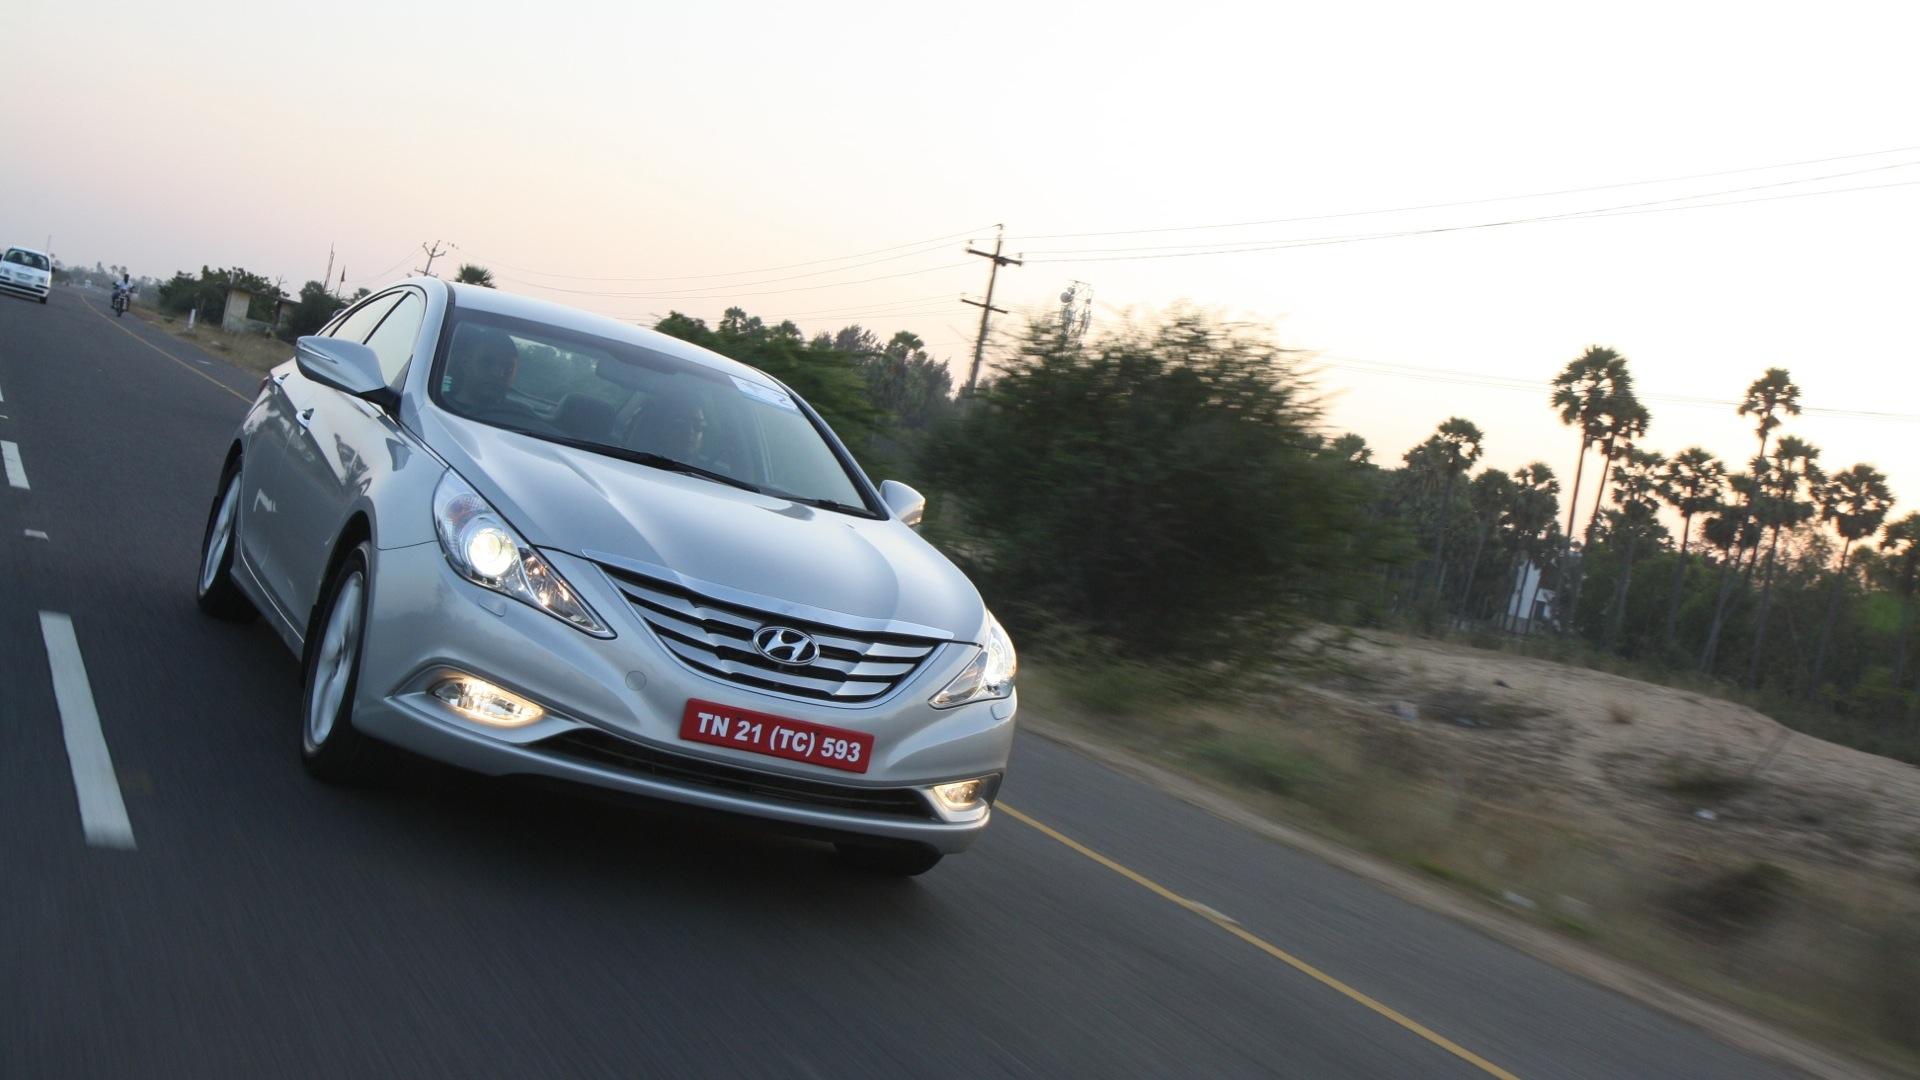 2013 Corolla Overdrive Upcomingcarshq Com